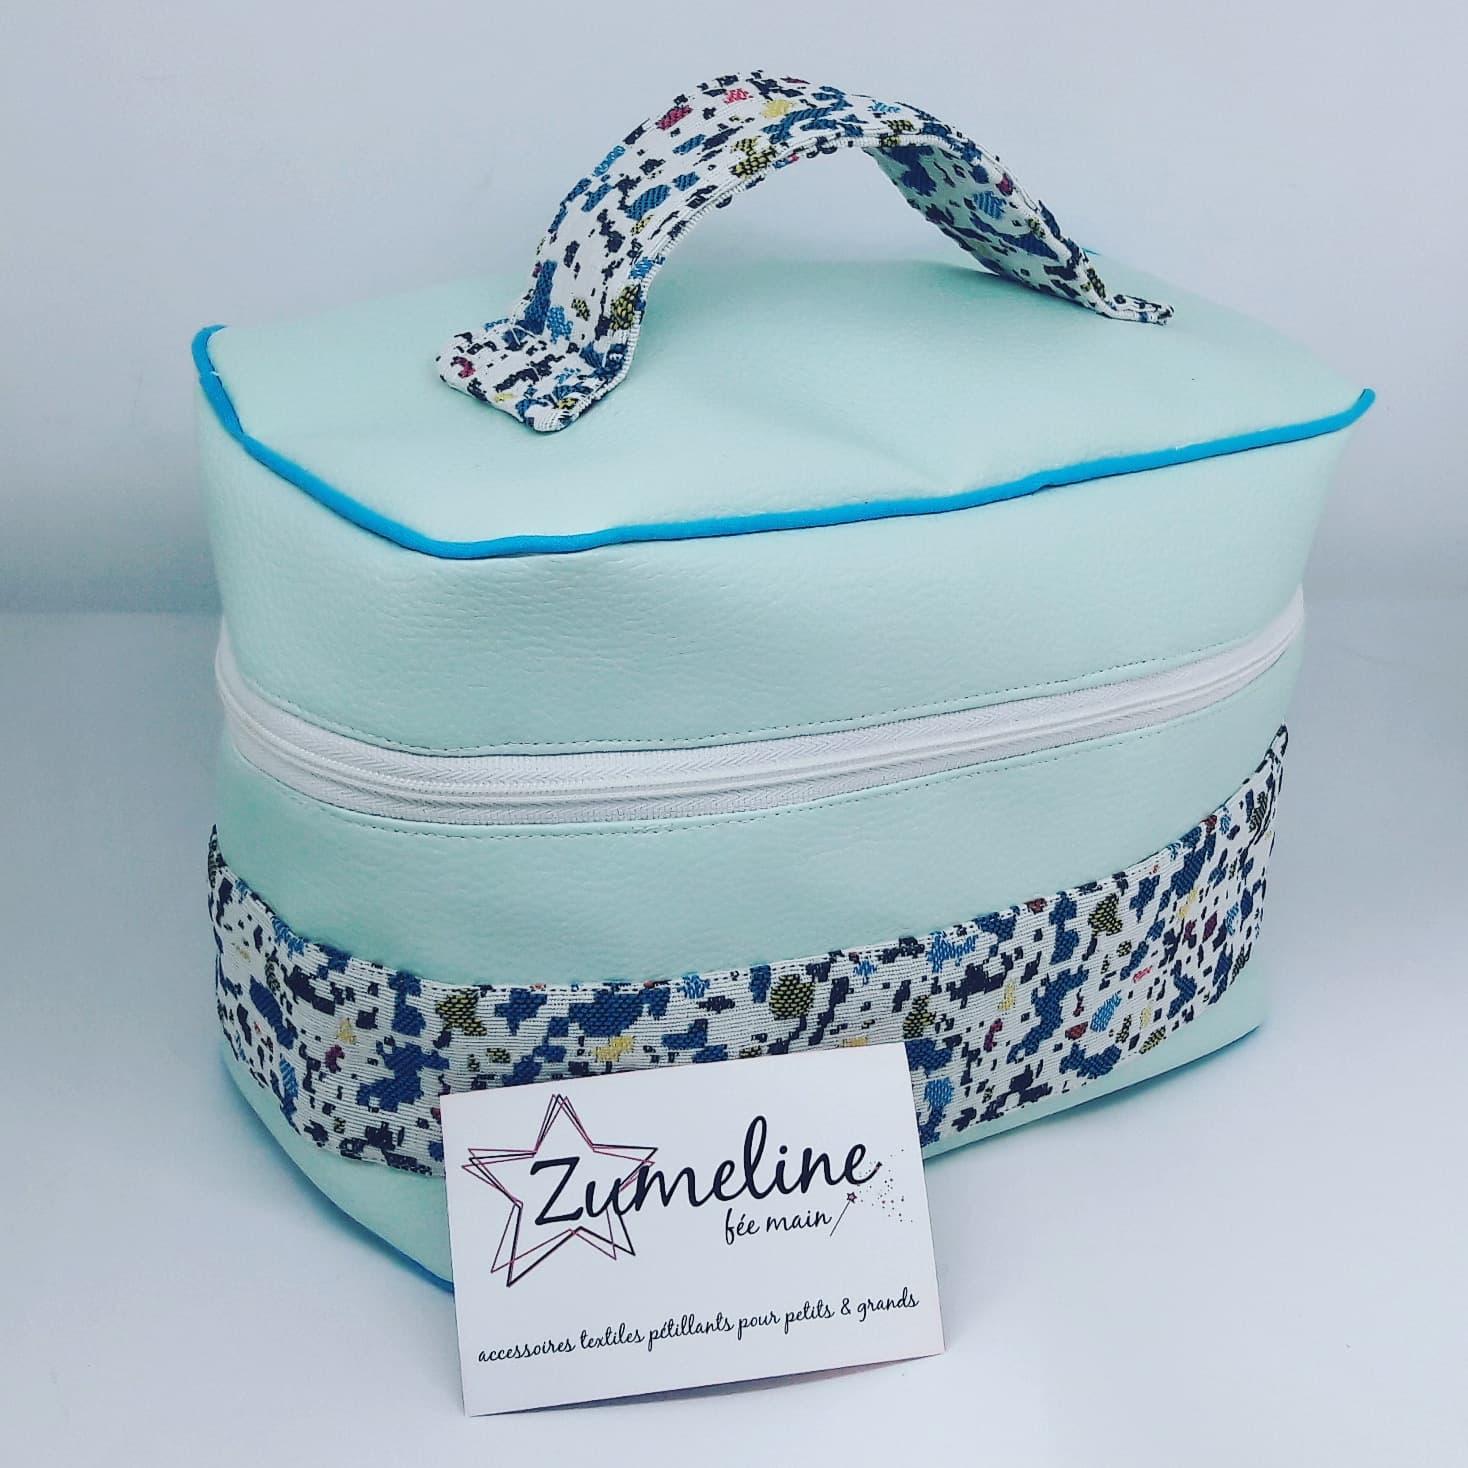 atelier couture juvisy essonne zumeline vanity